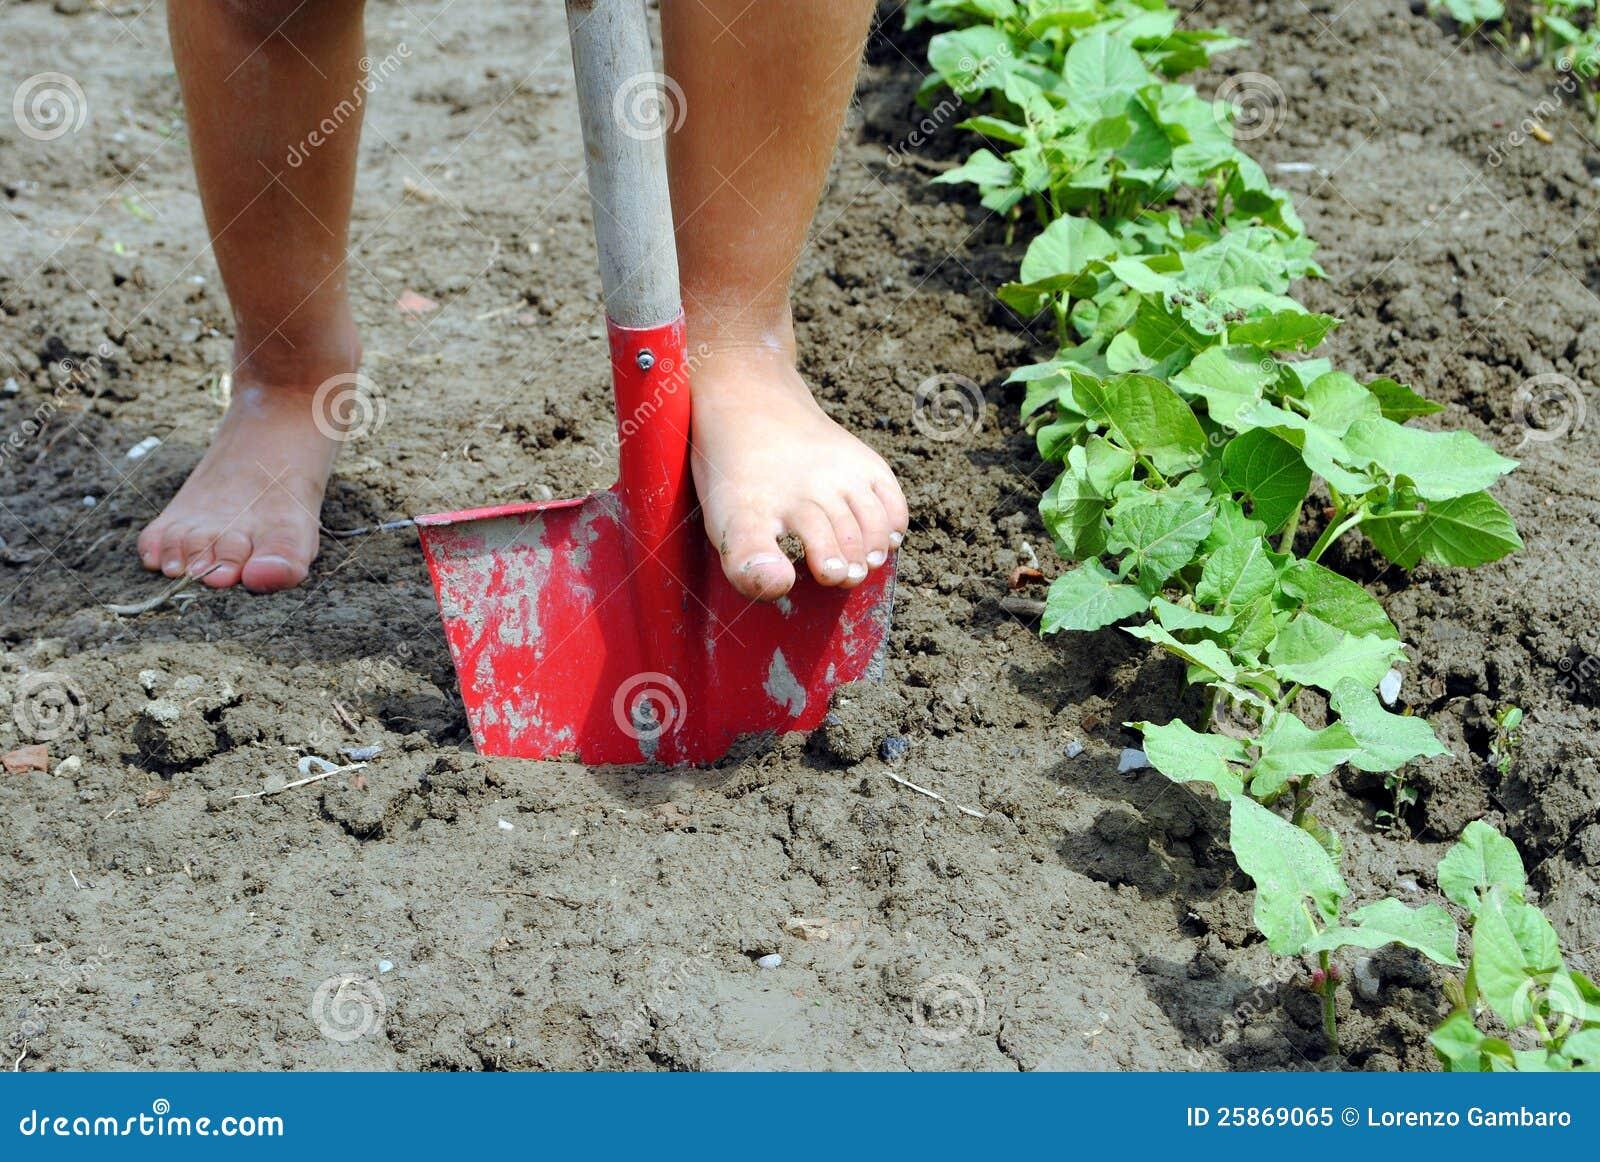 Kid Feet Kid feet over a shovel in the